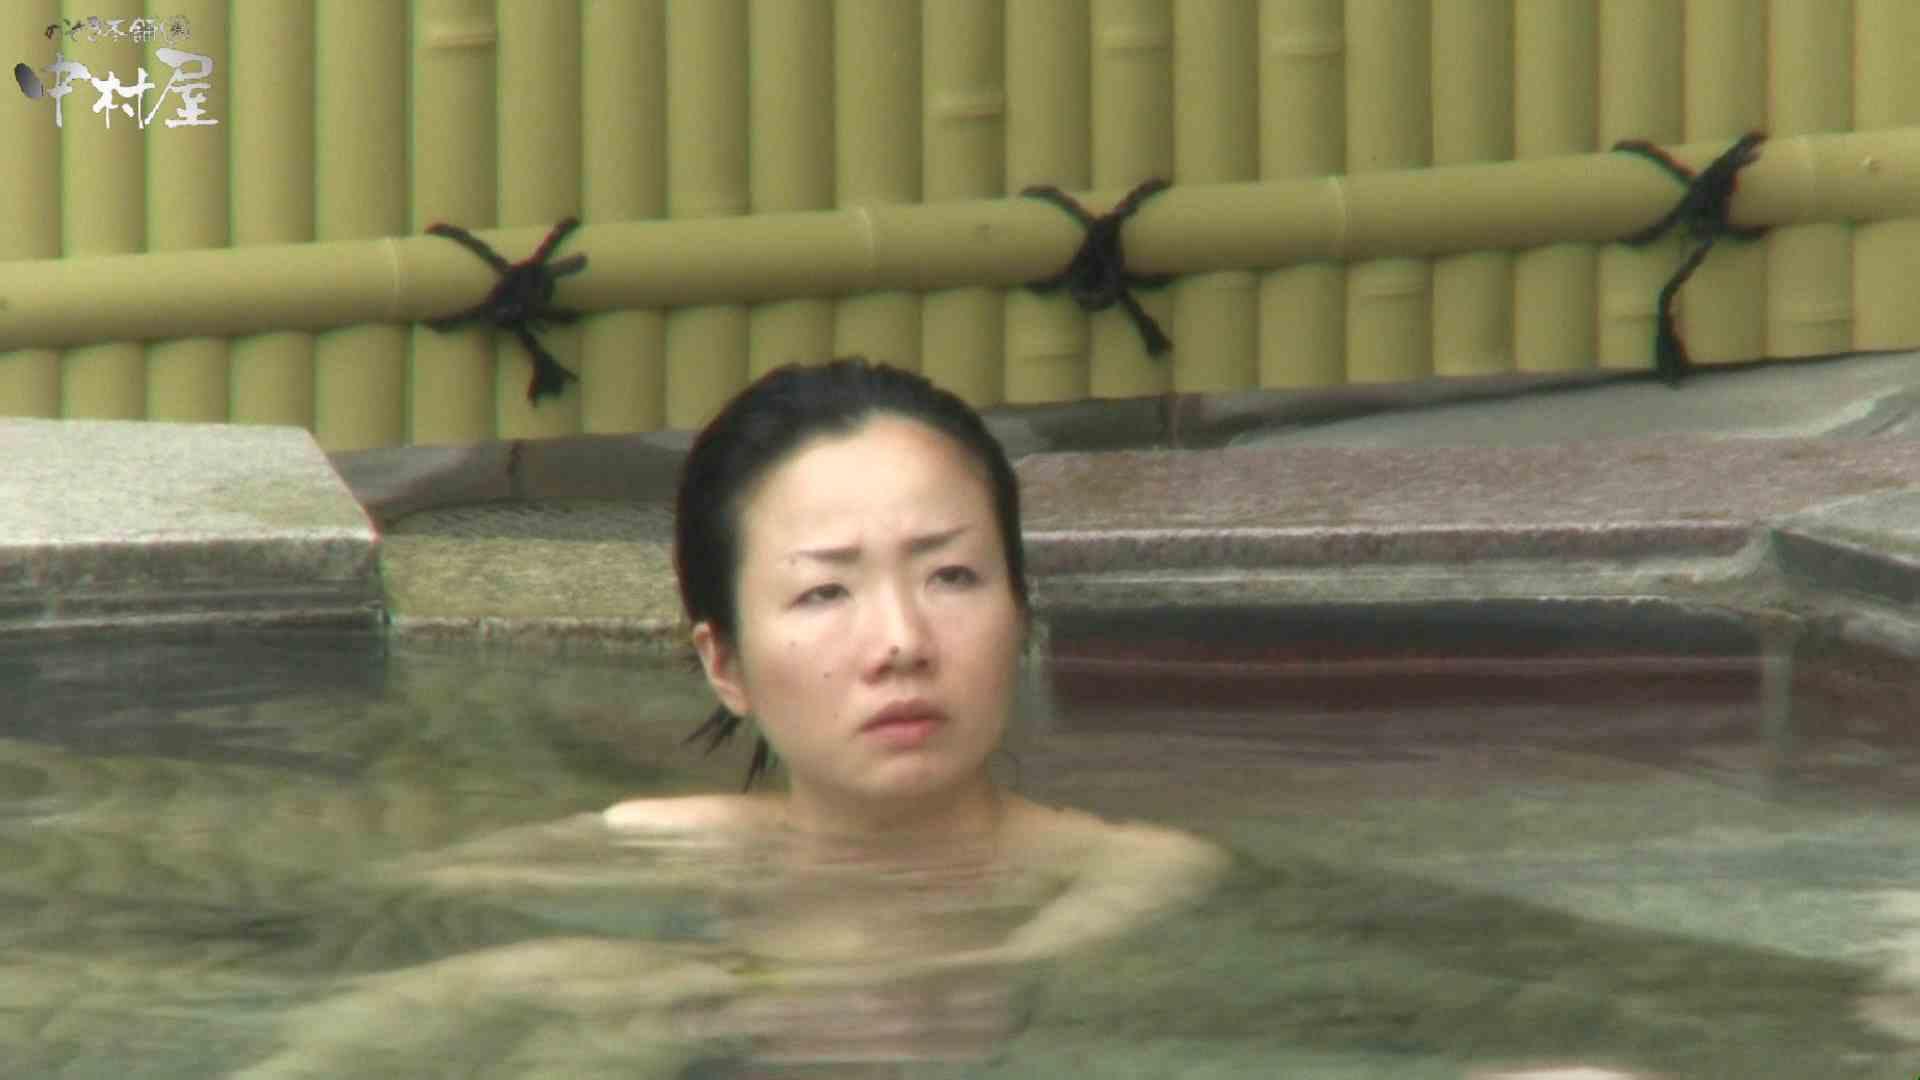 Aquaな露天風呂Vol.950 盗撮シリーズ   露天風呂編  80PIX 1